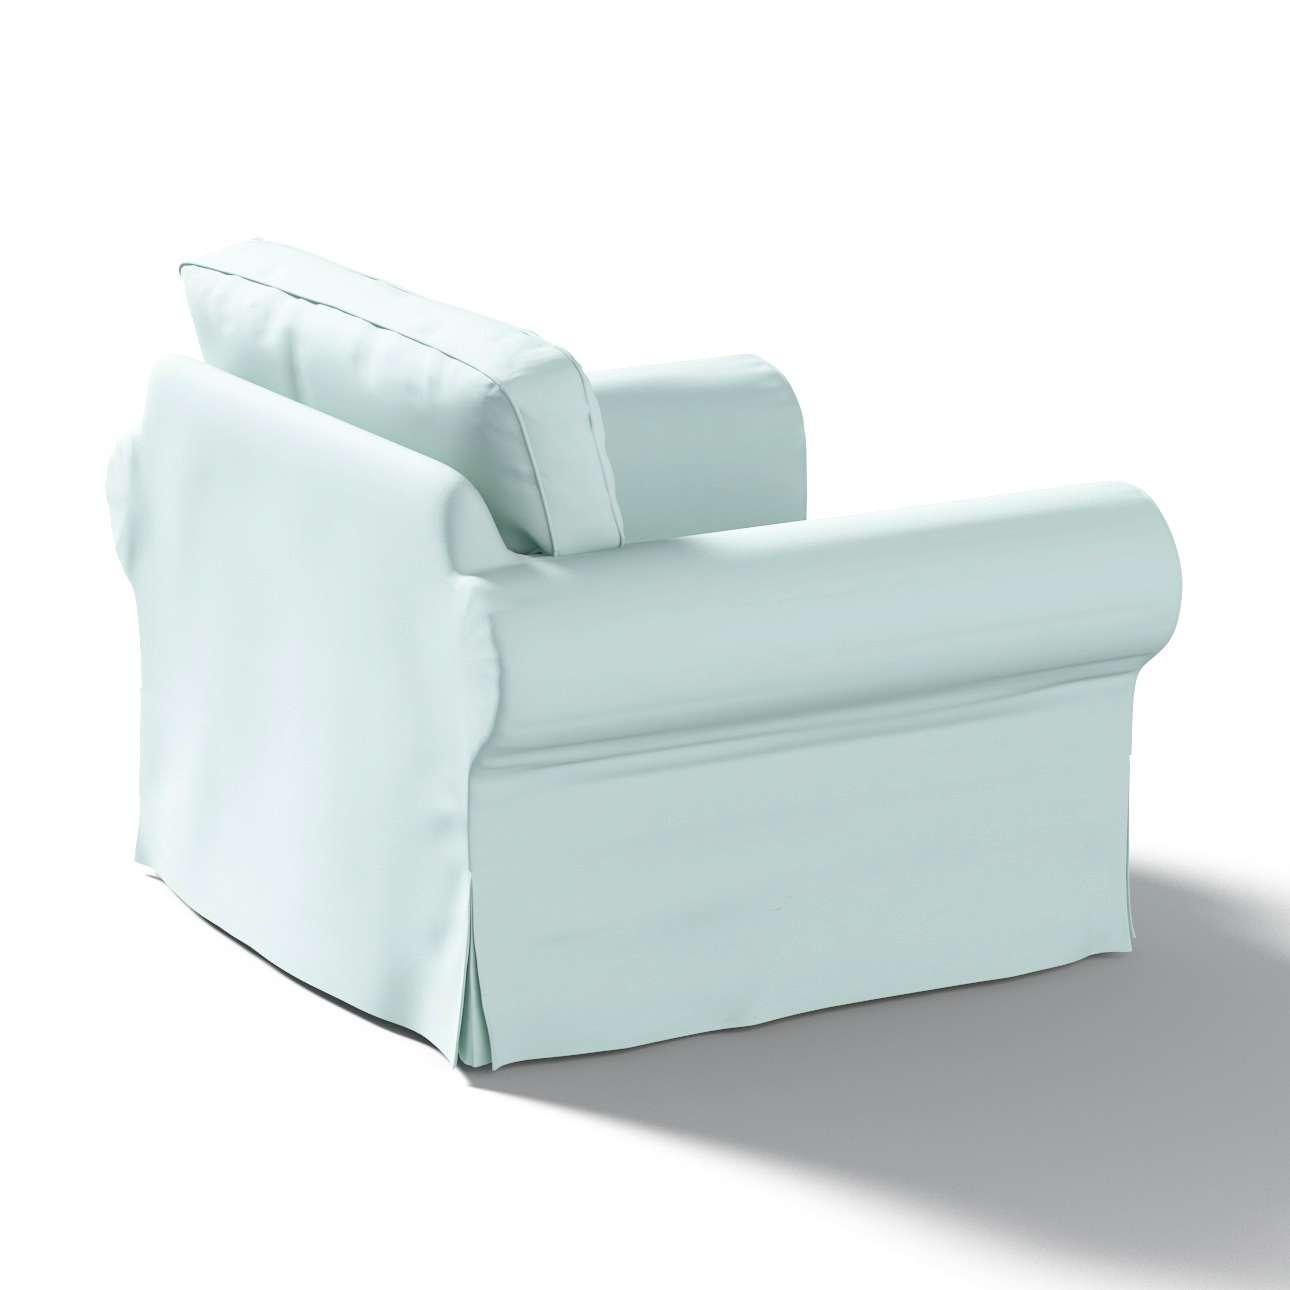 Potah na křeslo IKEA Ektorp kØeslo Ektorp v kolekci Cotton Panama, látka: 702-10